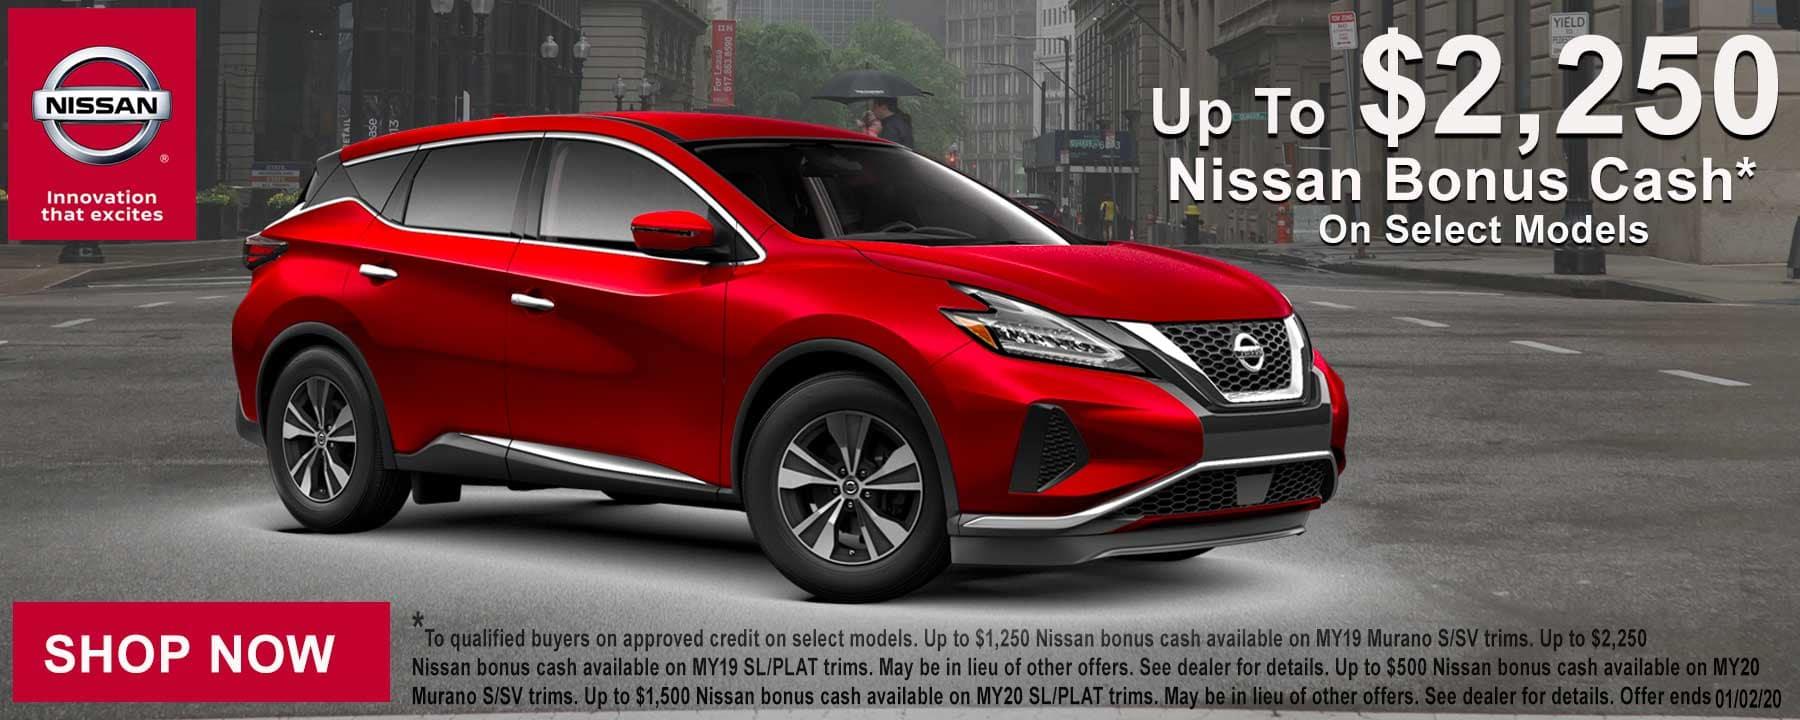 Save THOUSANDS with Nissan Bonus Cash on Select 2019 or 2020 Nissan Murano